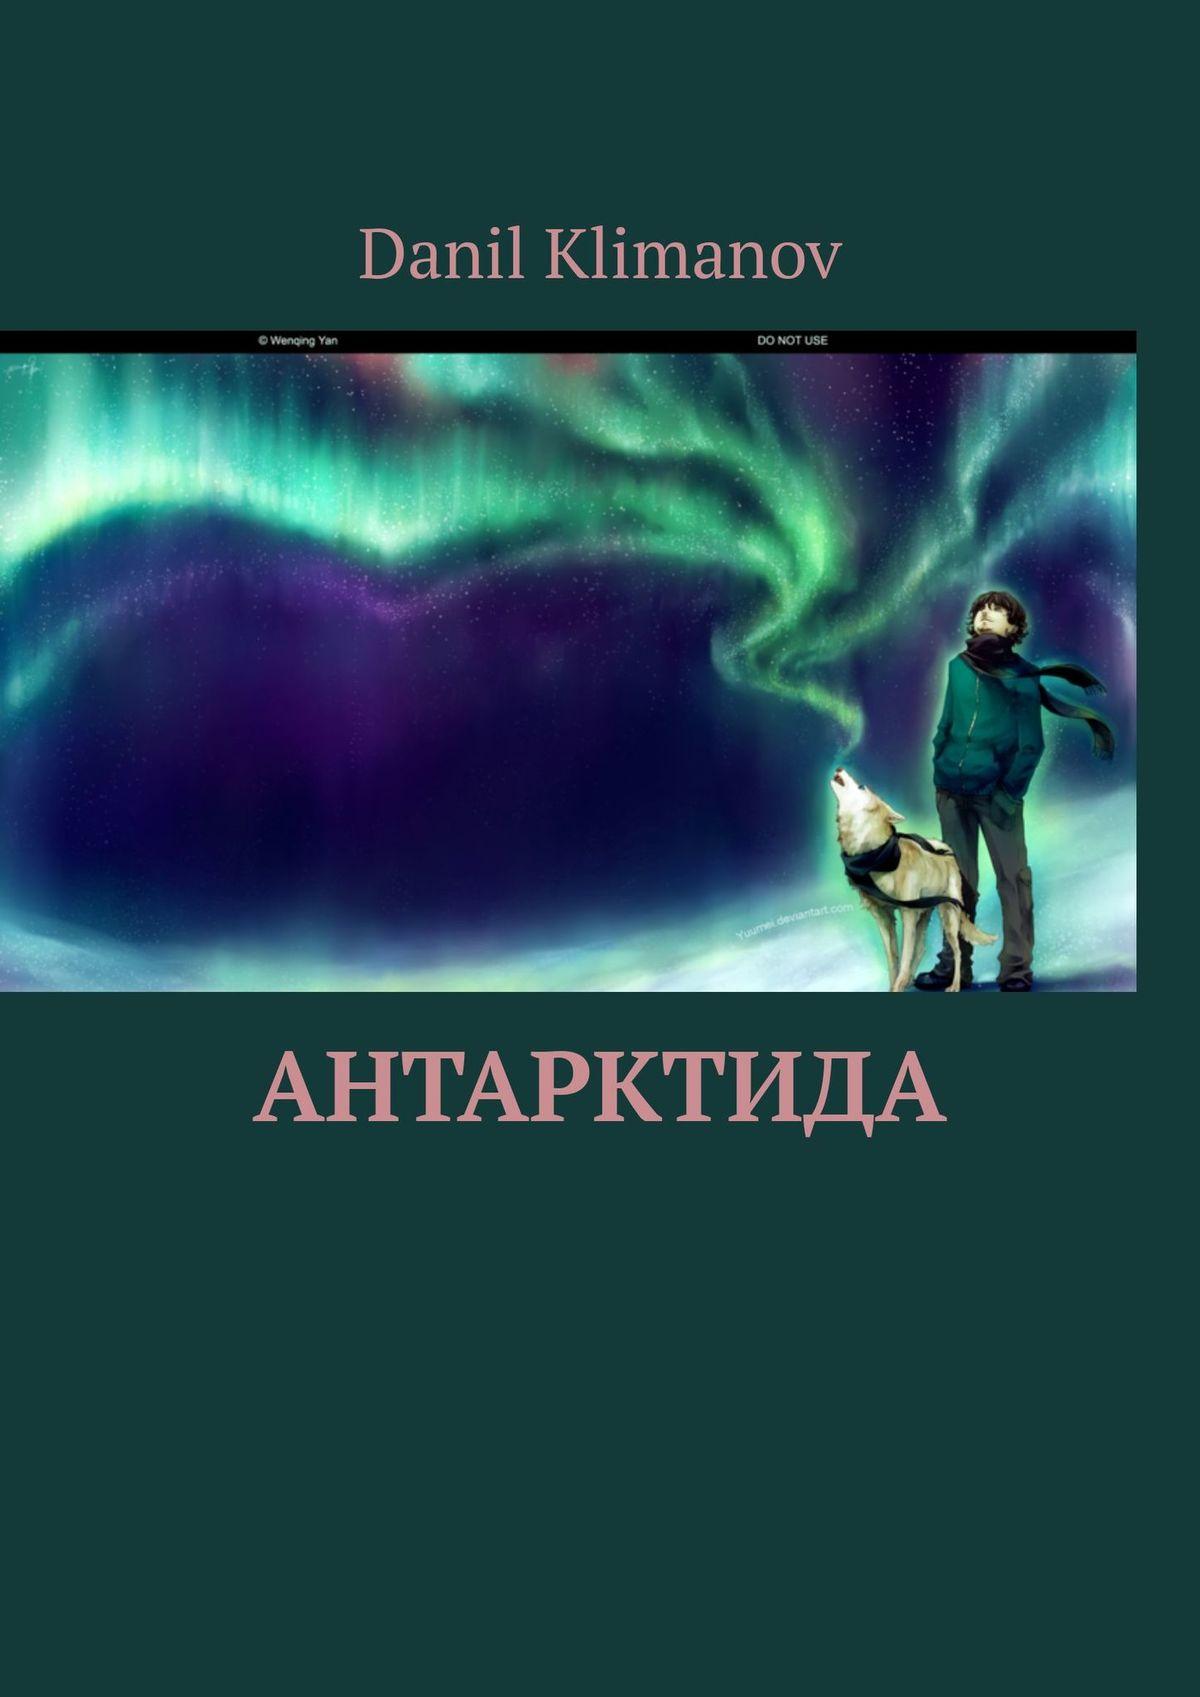 Danil Pavlovich Klimanov Антарктида константин скуратов рожденные в зоне дано не каждому